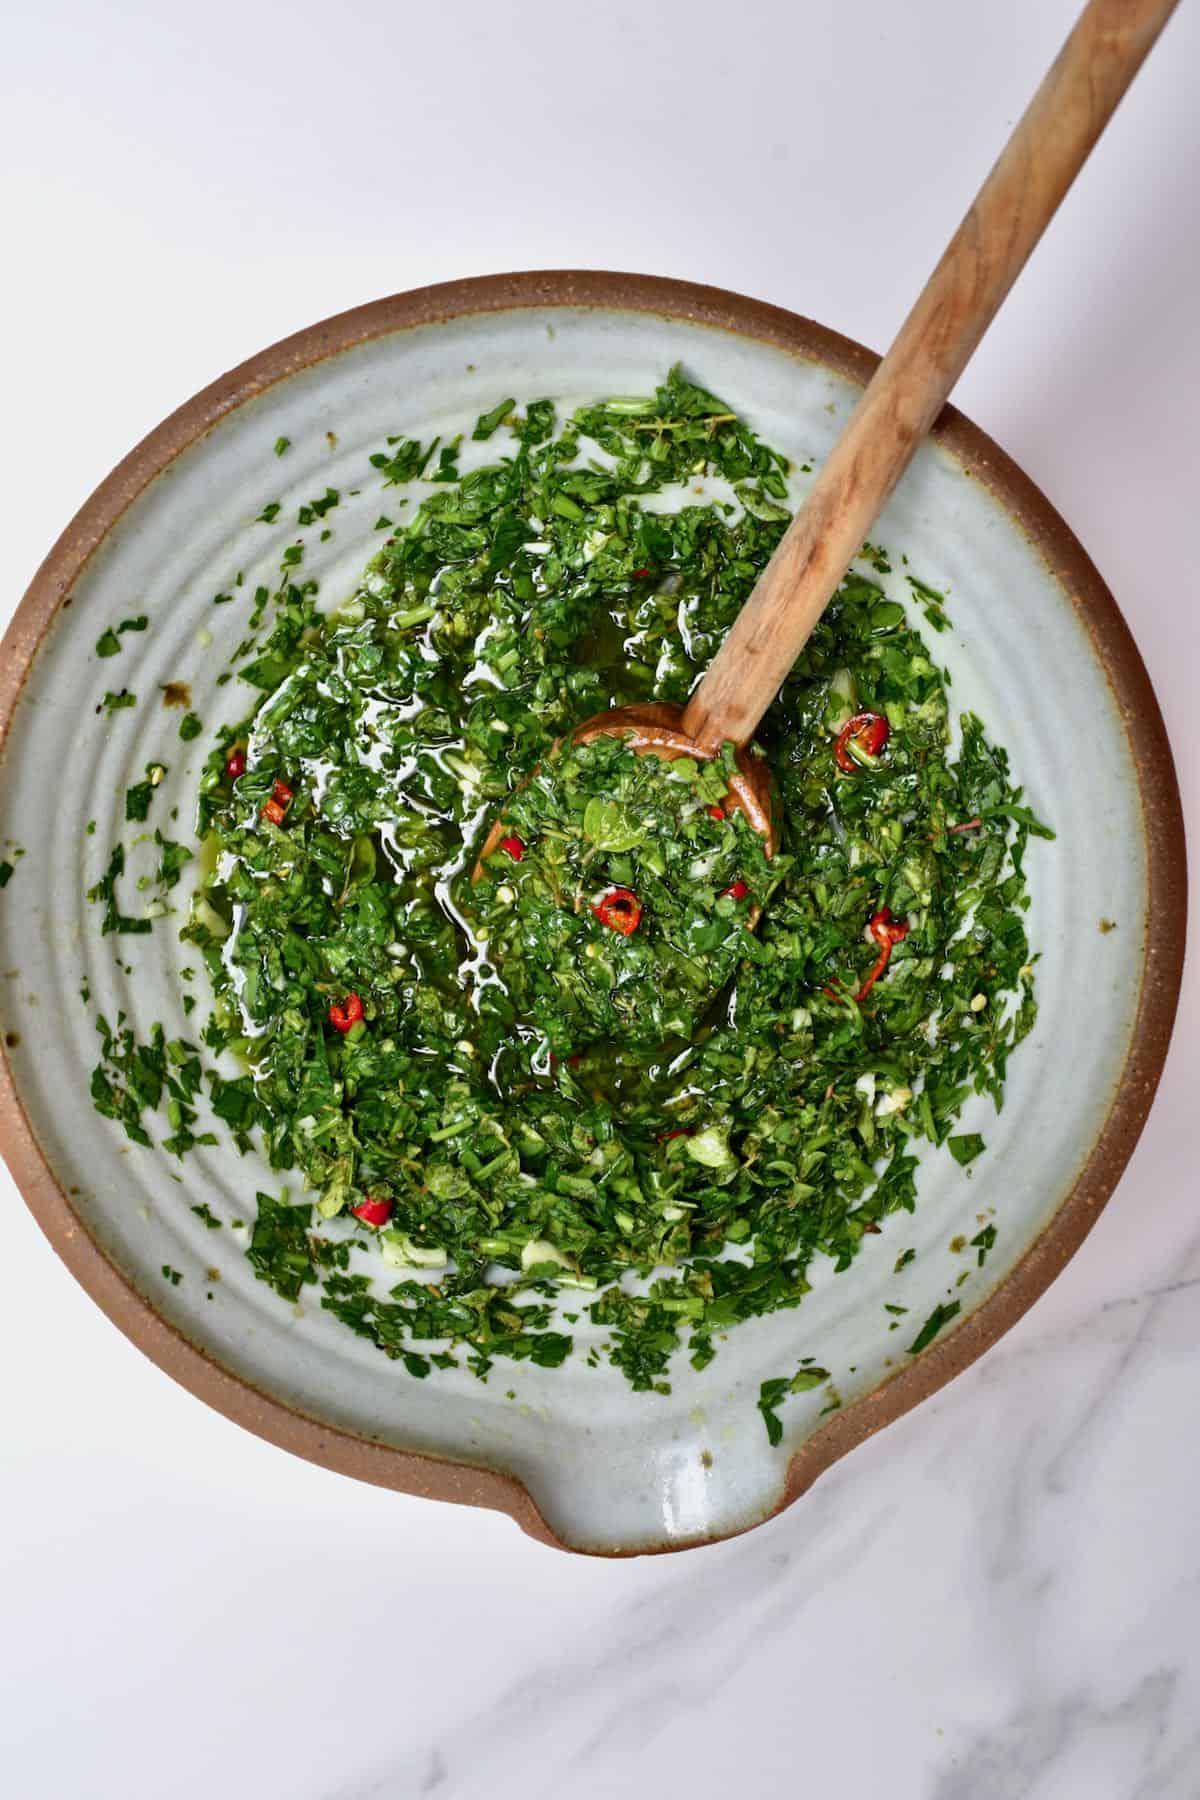 Making chimichurri in a bowl